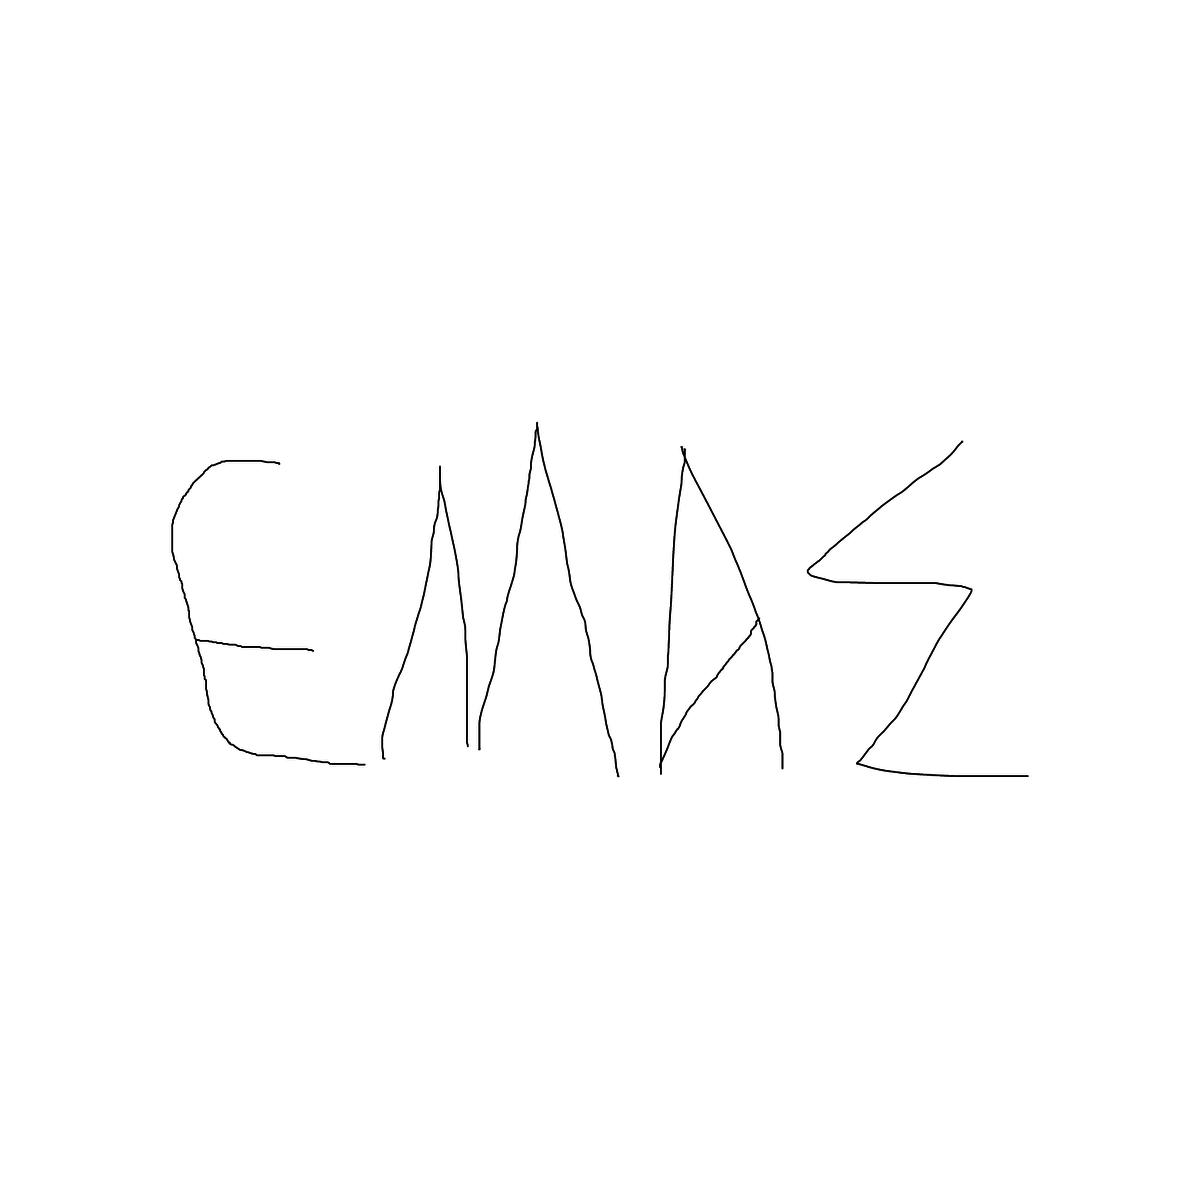 BAAAM drawing#6024 lat:38.4419136047363300lng: 23.6816024780273440